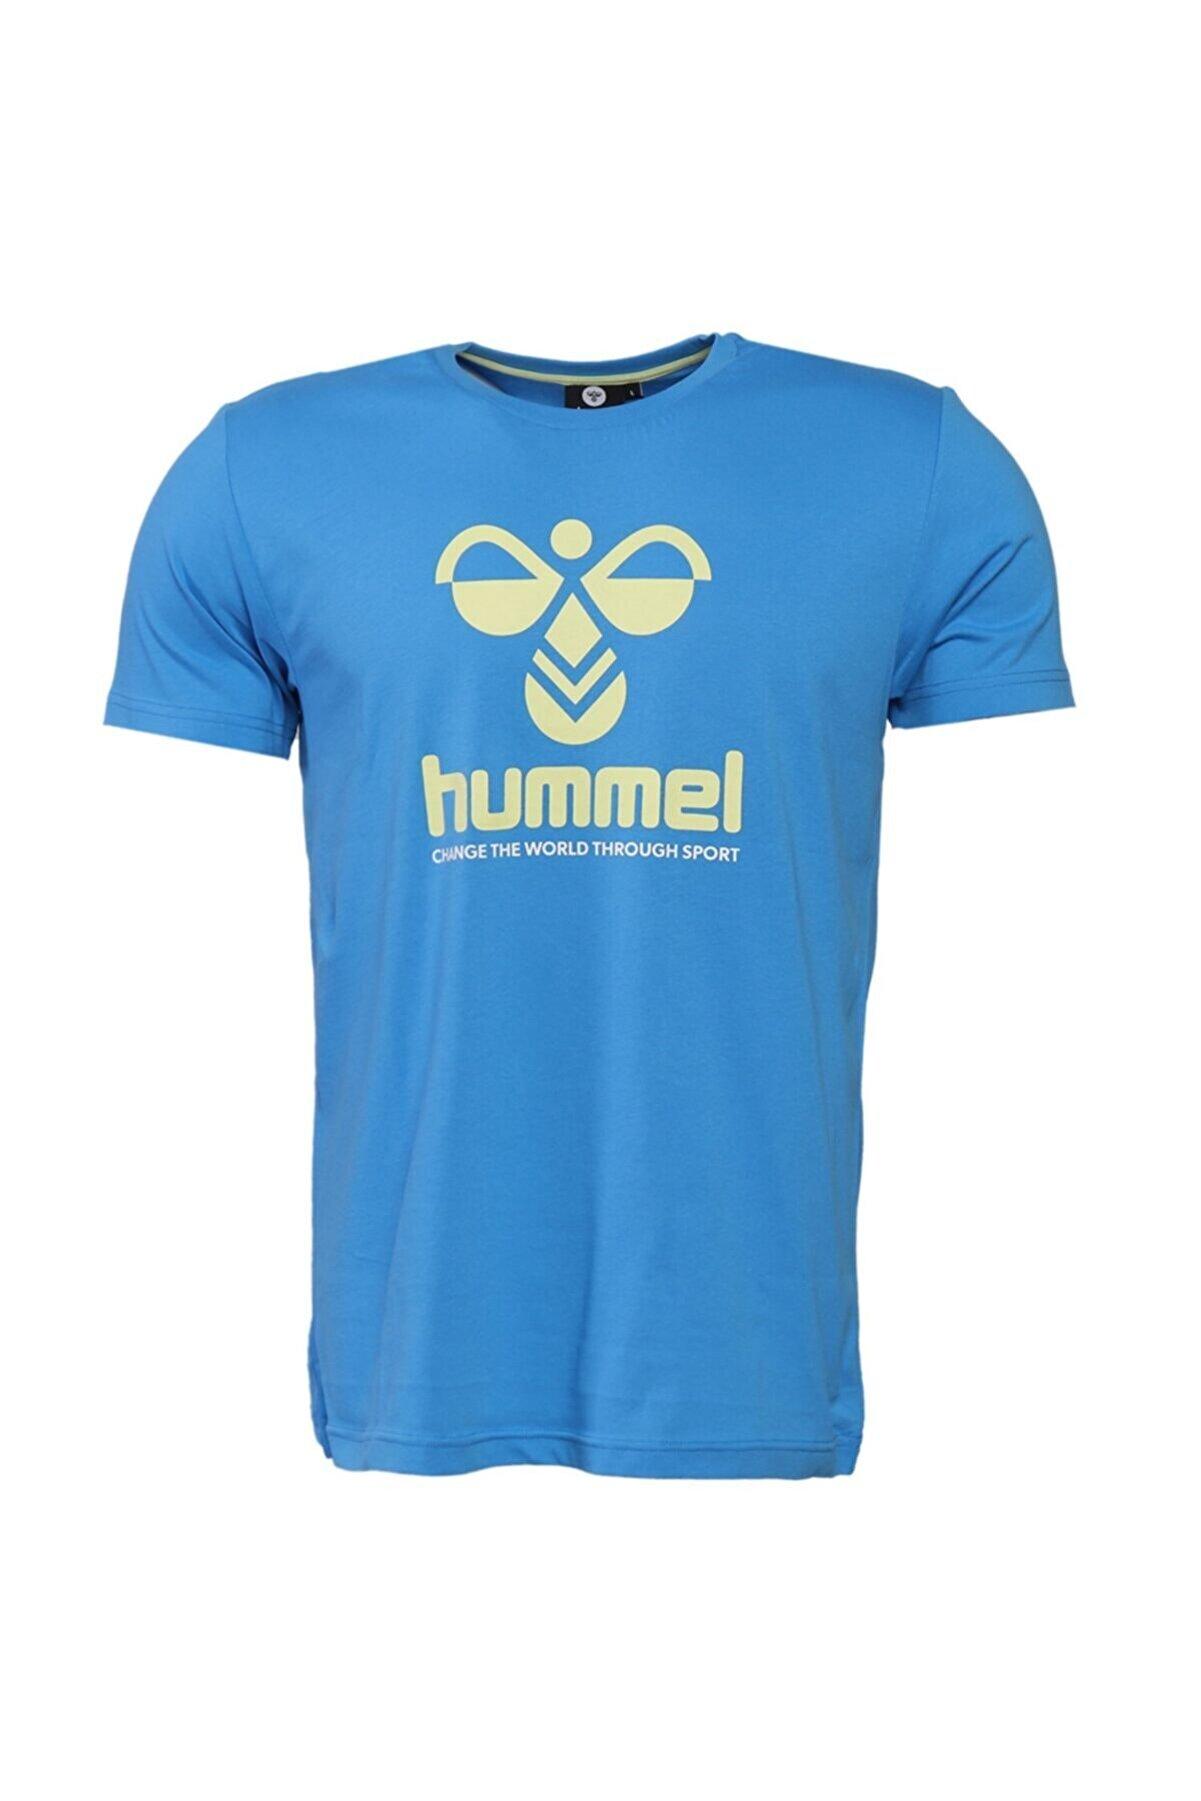 HUMMEL HMLCENTIL T-SHIRT S/S Mavi Erkek T-Shirt 101086299